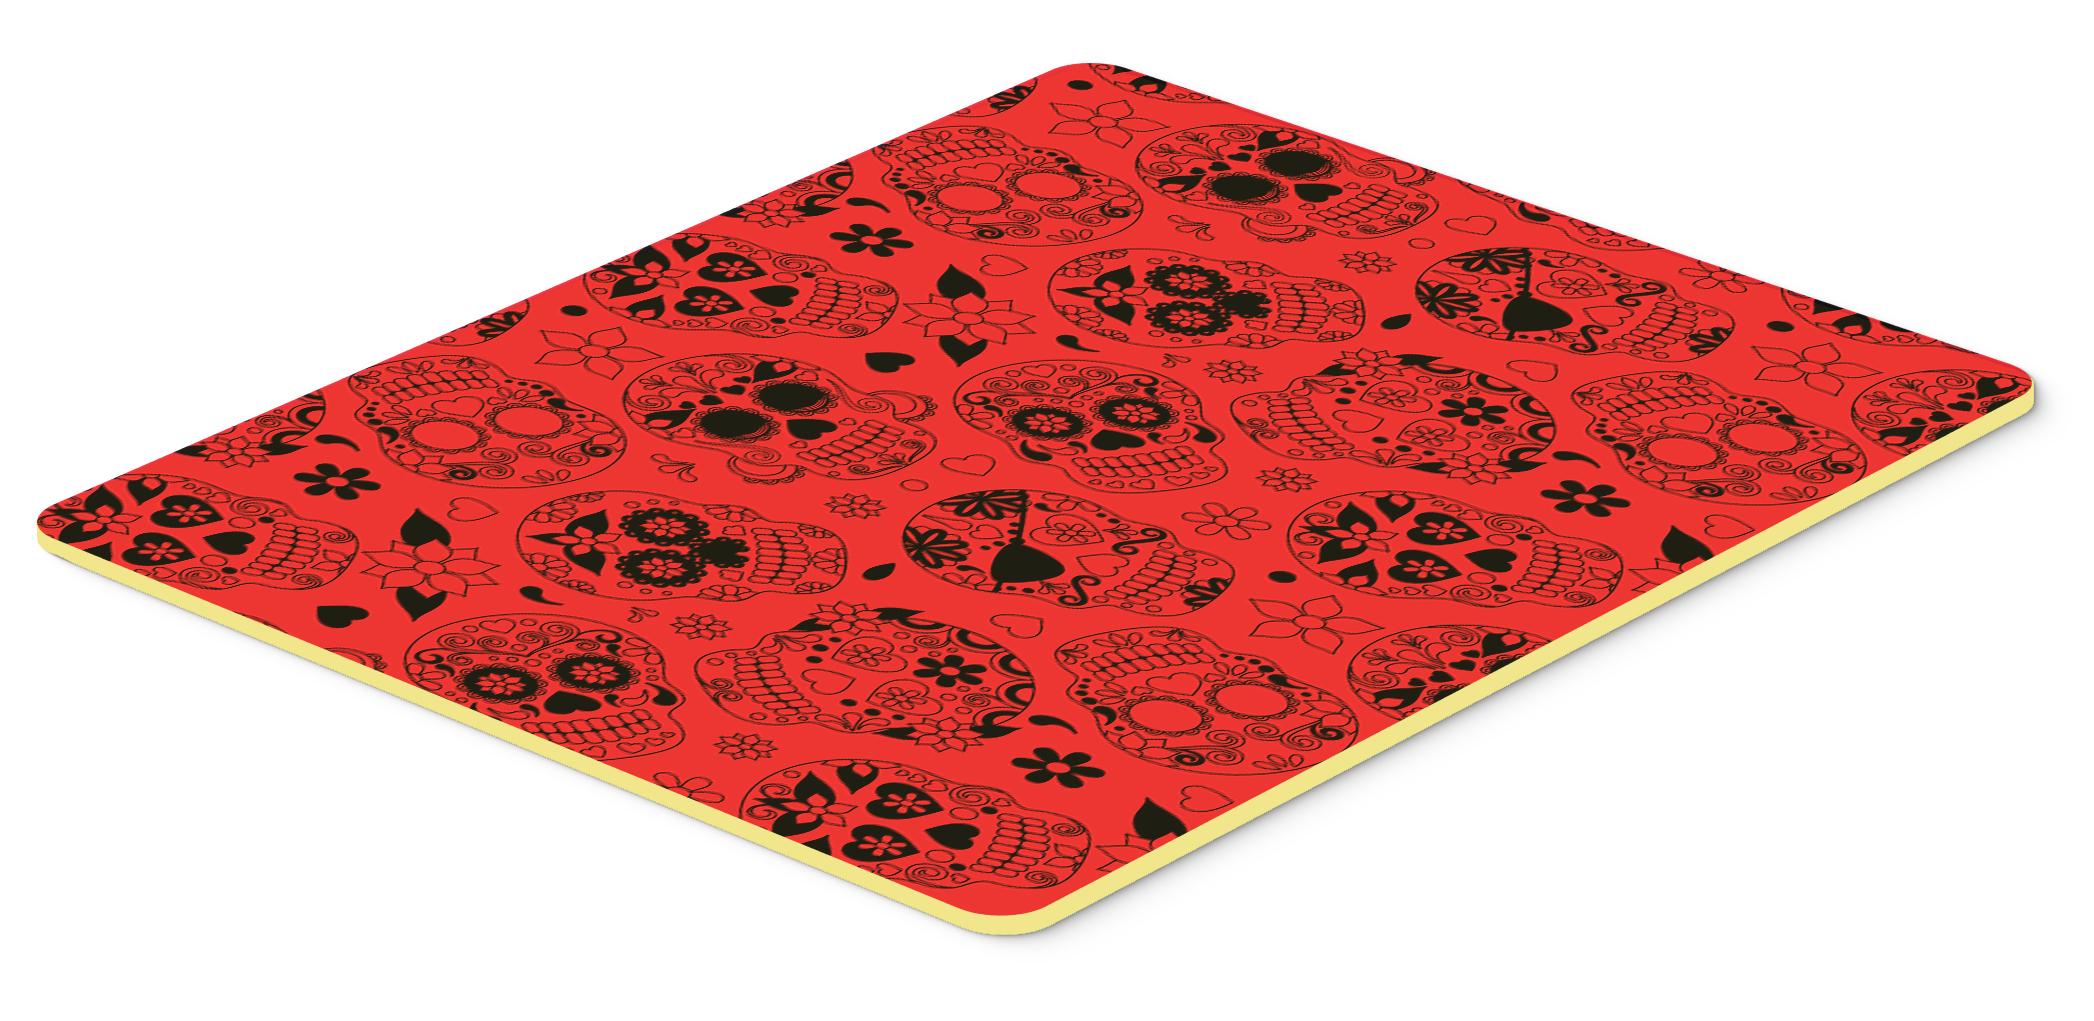 Day of the dead orange kitchen or bath mat 24x36 tanga - Orange kitchen floor mats ...